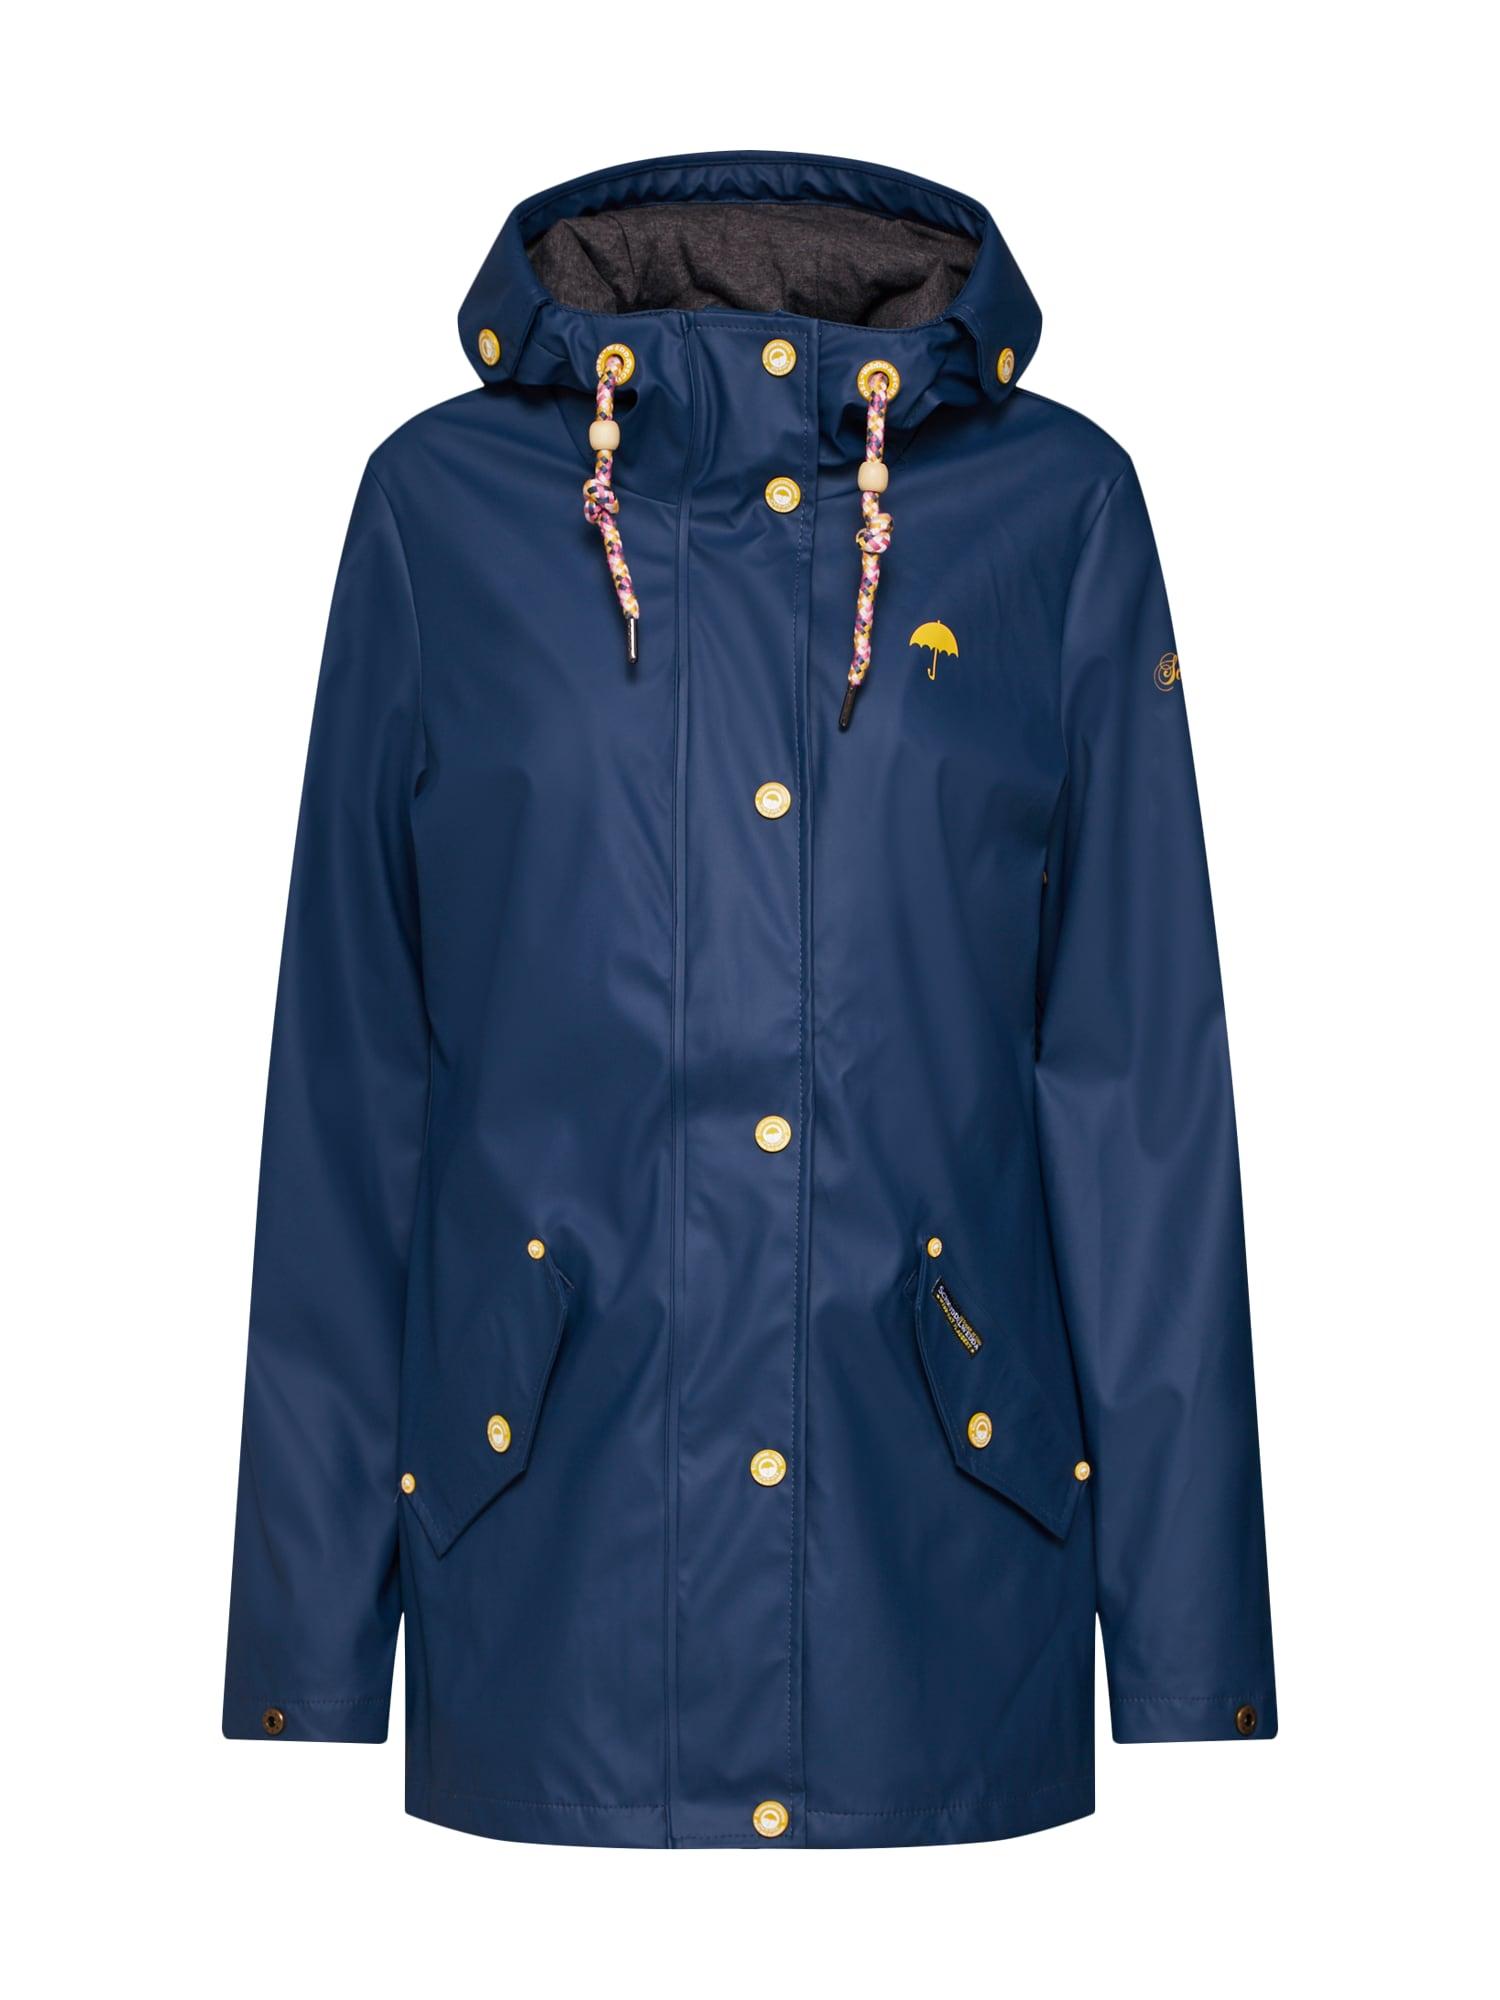 Přechodná bunda tmavě modrá Schmuddelwedda